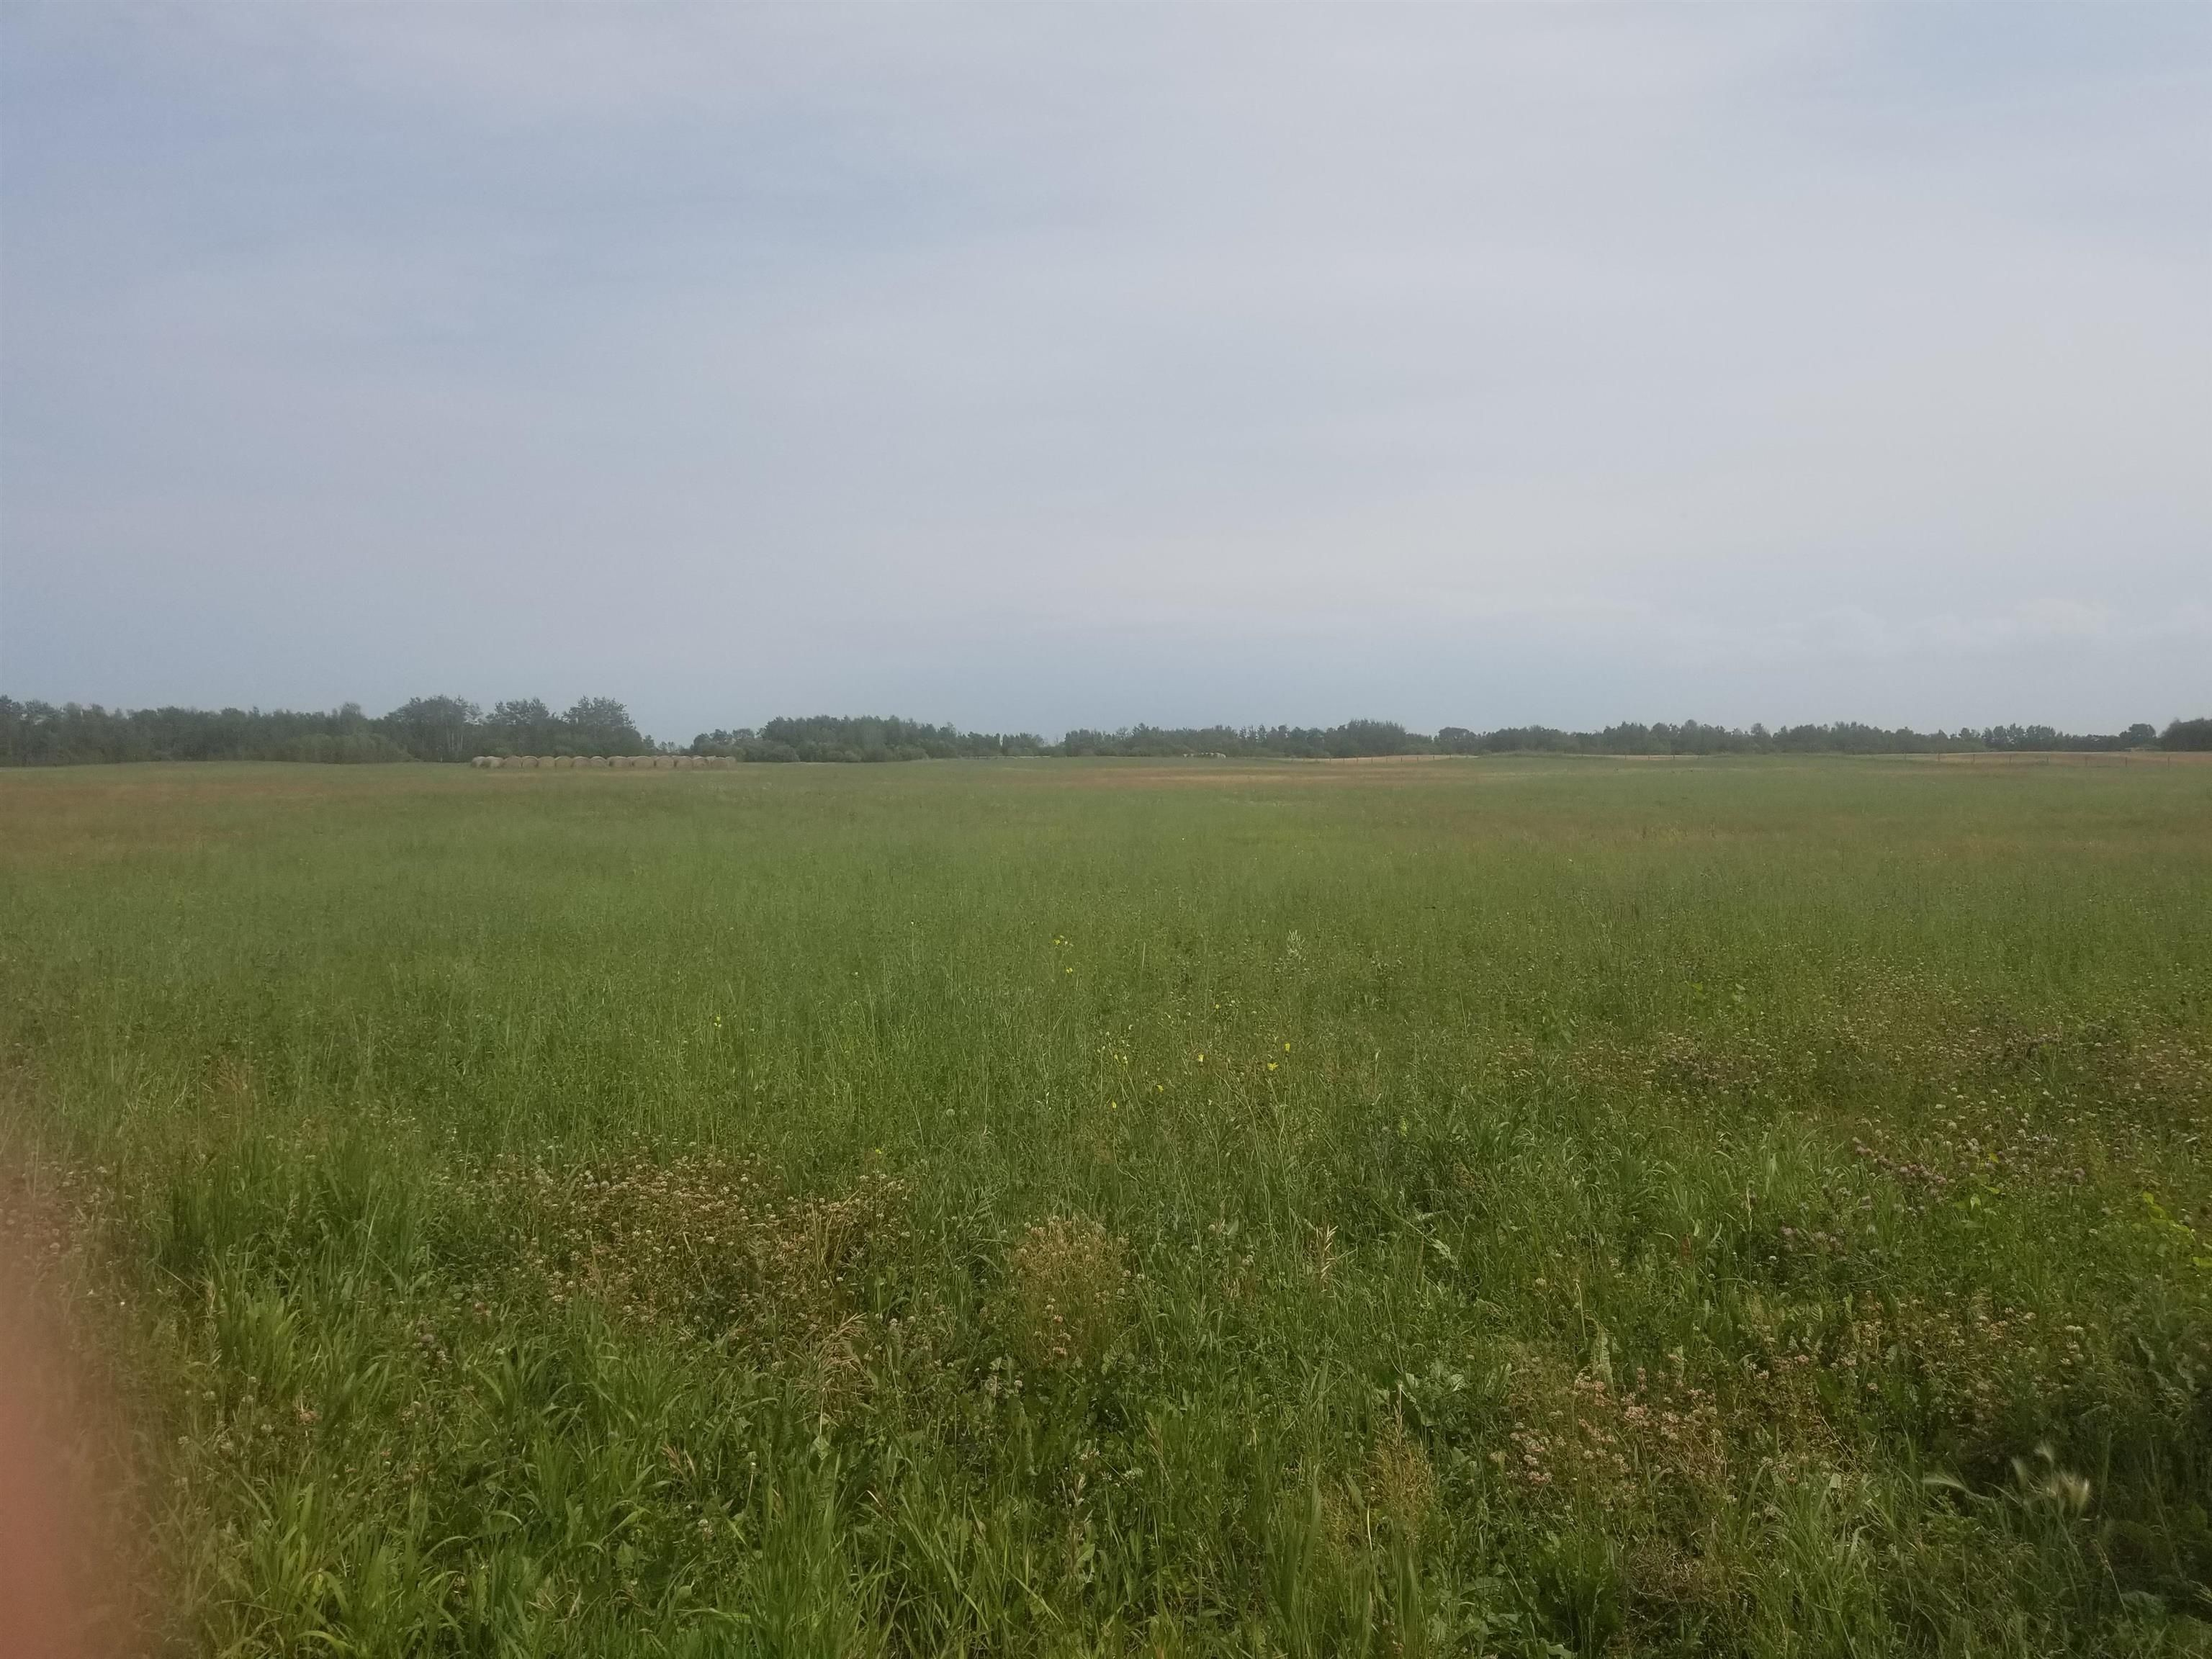 Main Photo: 60437 RRn 230: Rural Thorhild County House for sale : MLS®# E4265154